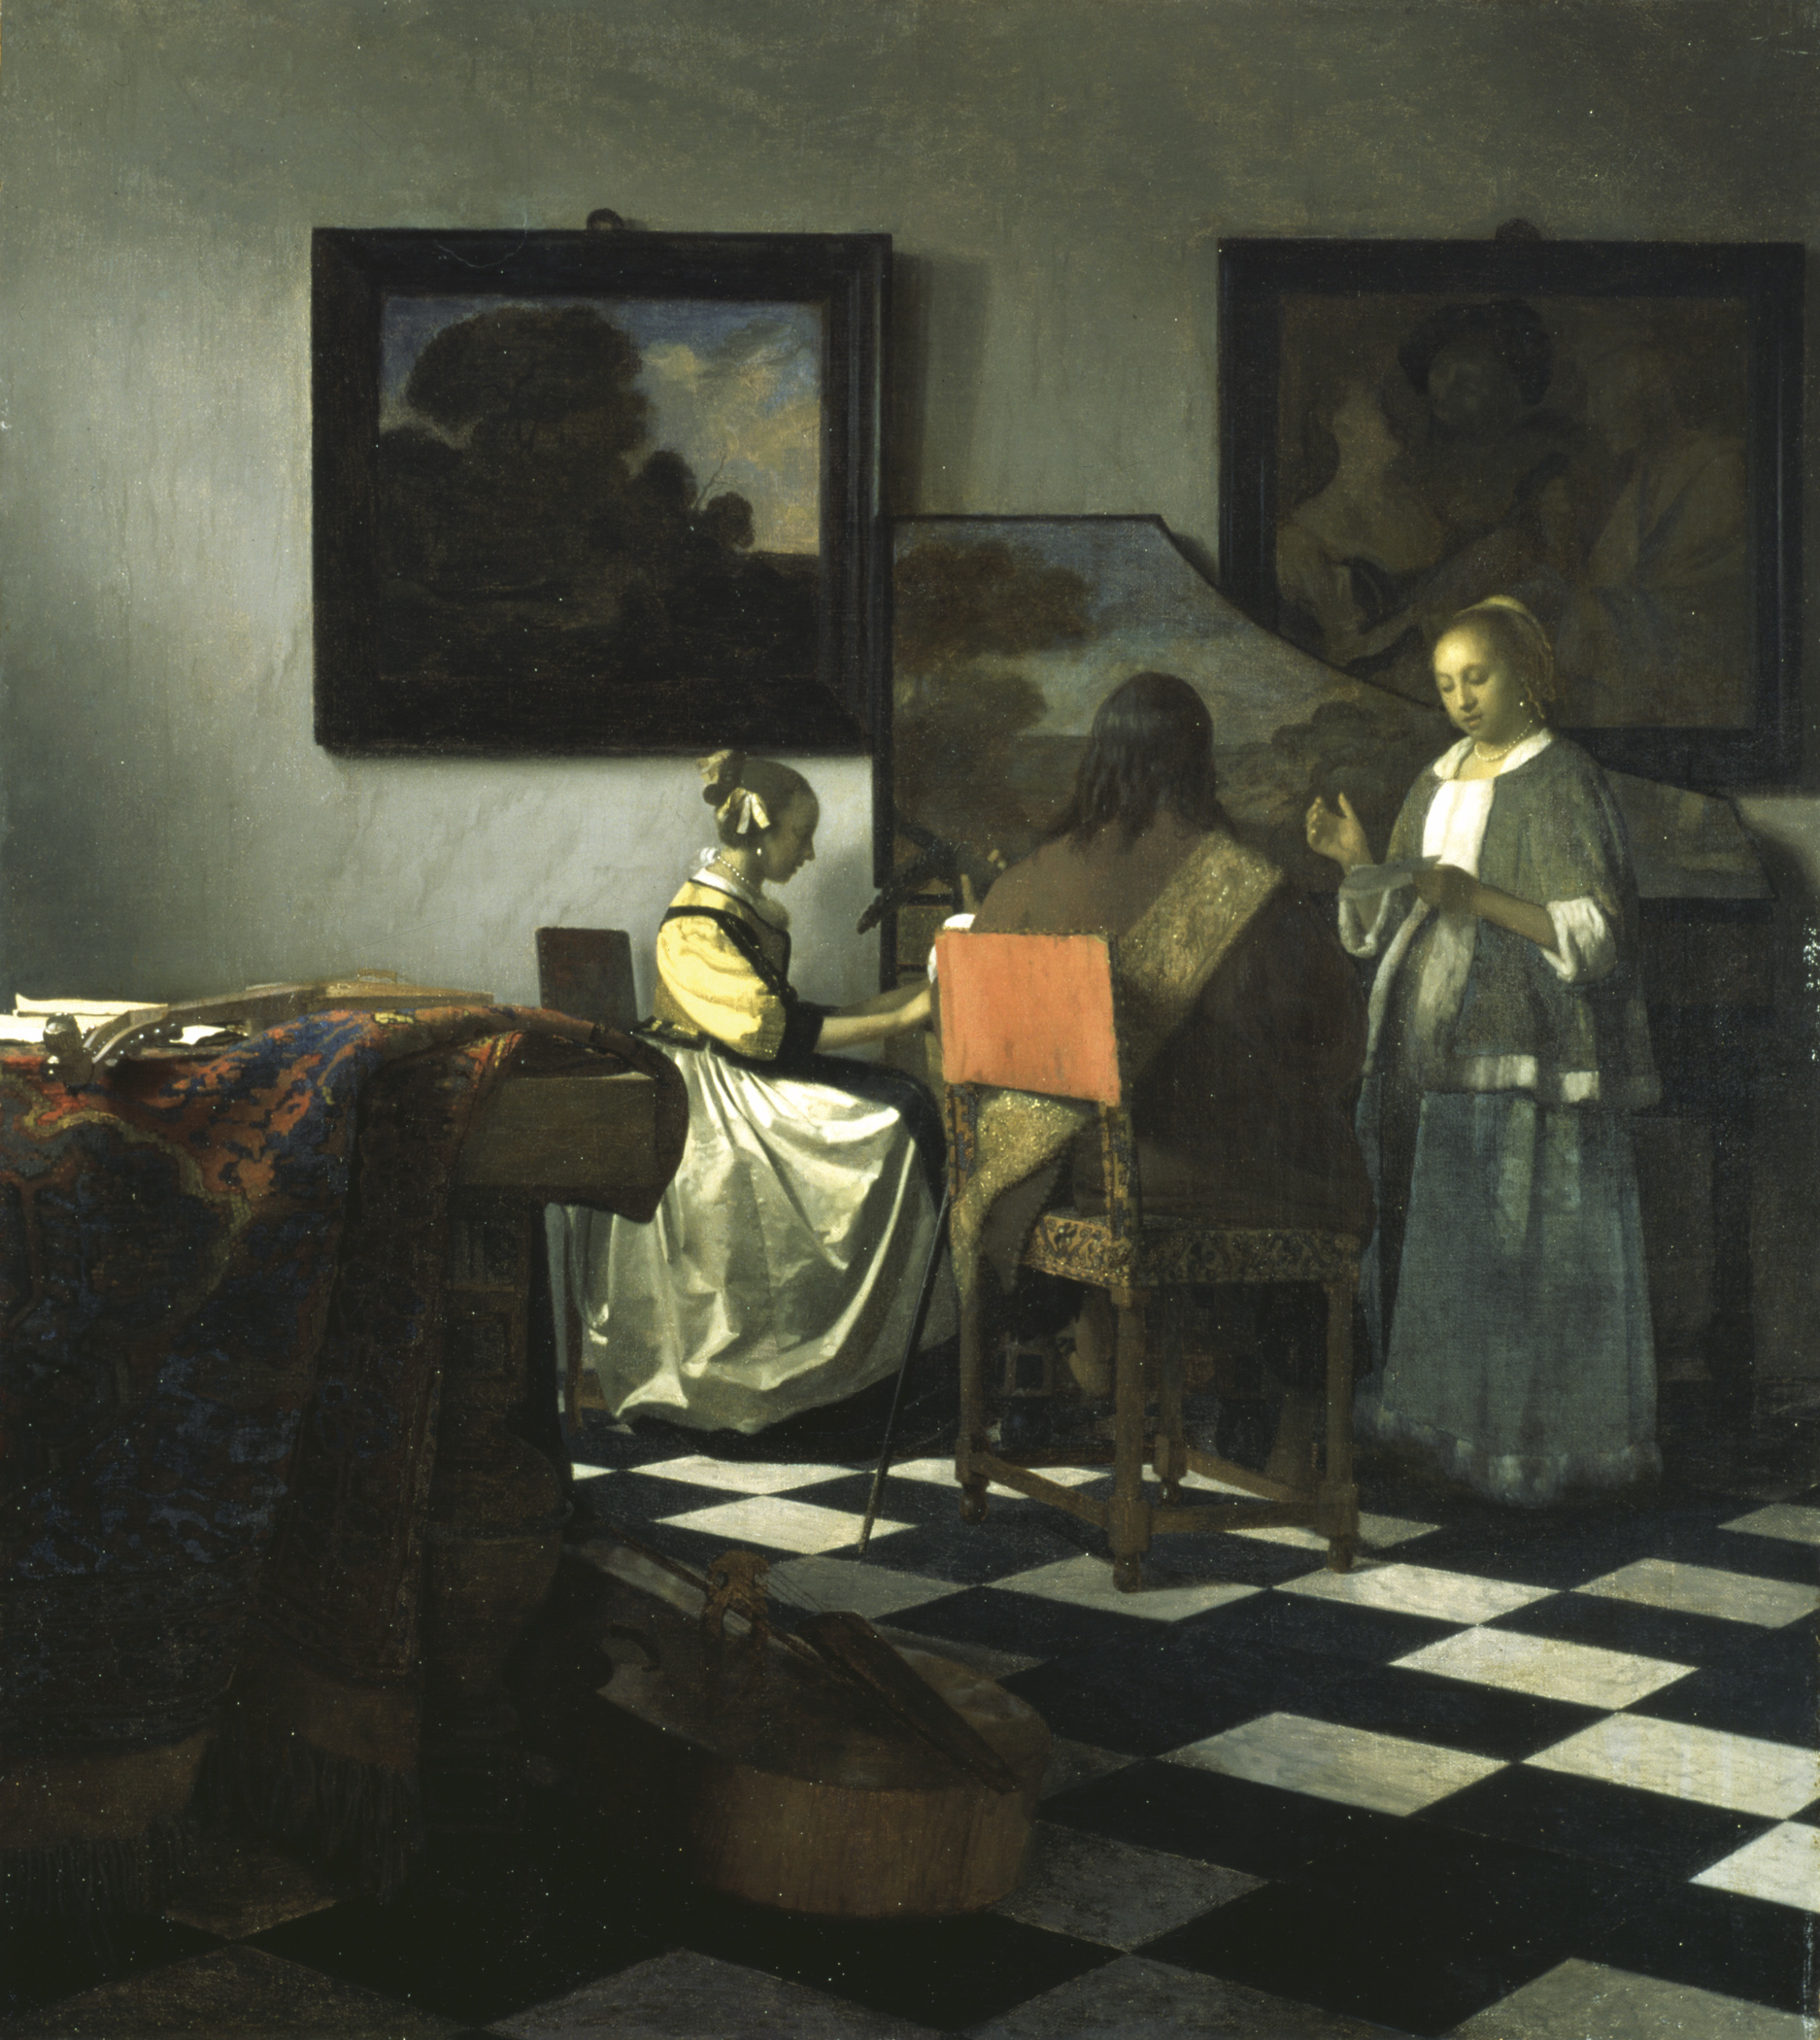 https-::upload.wikimedia.org:wikipedia:commons:c:c8:Vermeer_The_concert.JPG